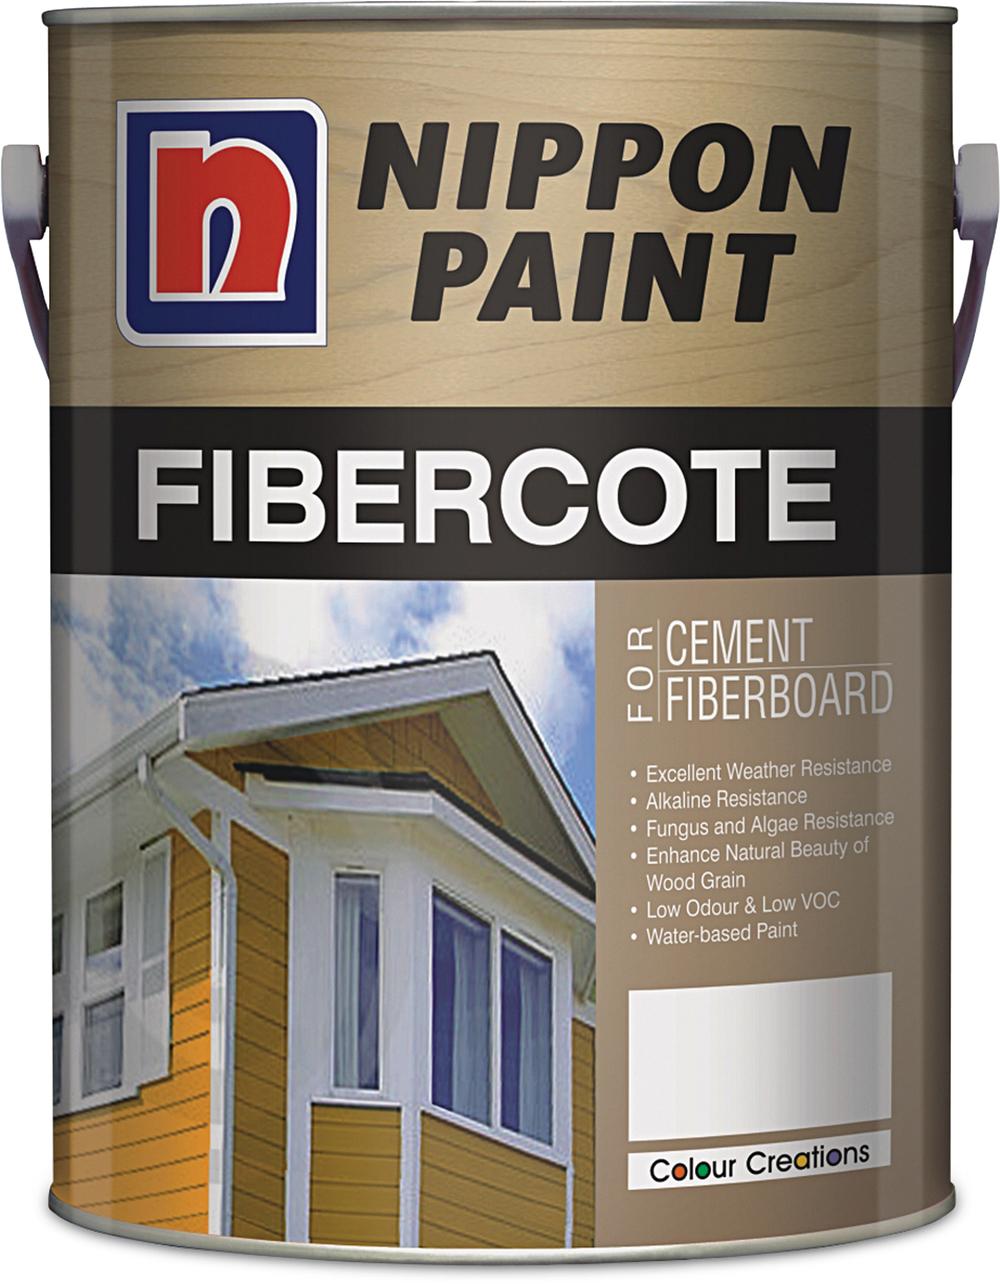 fibercote-packshot.jpg